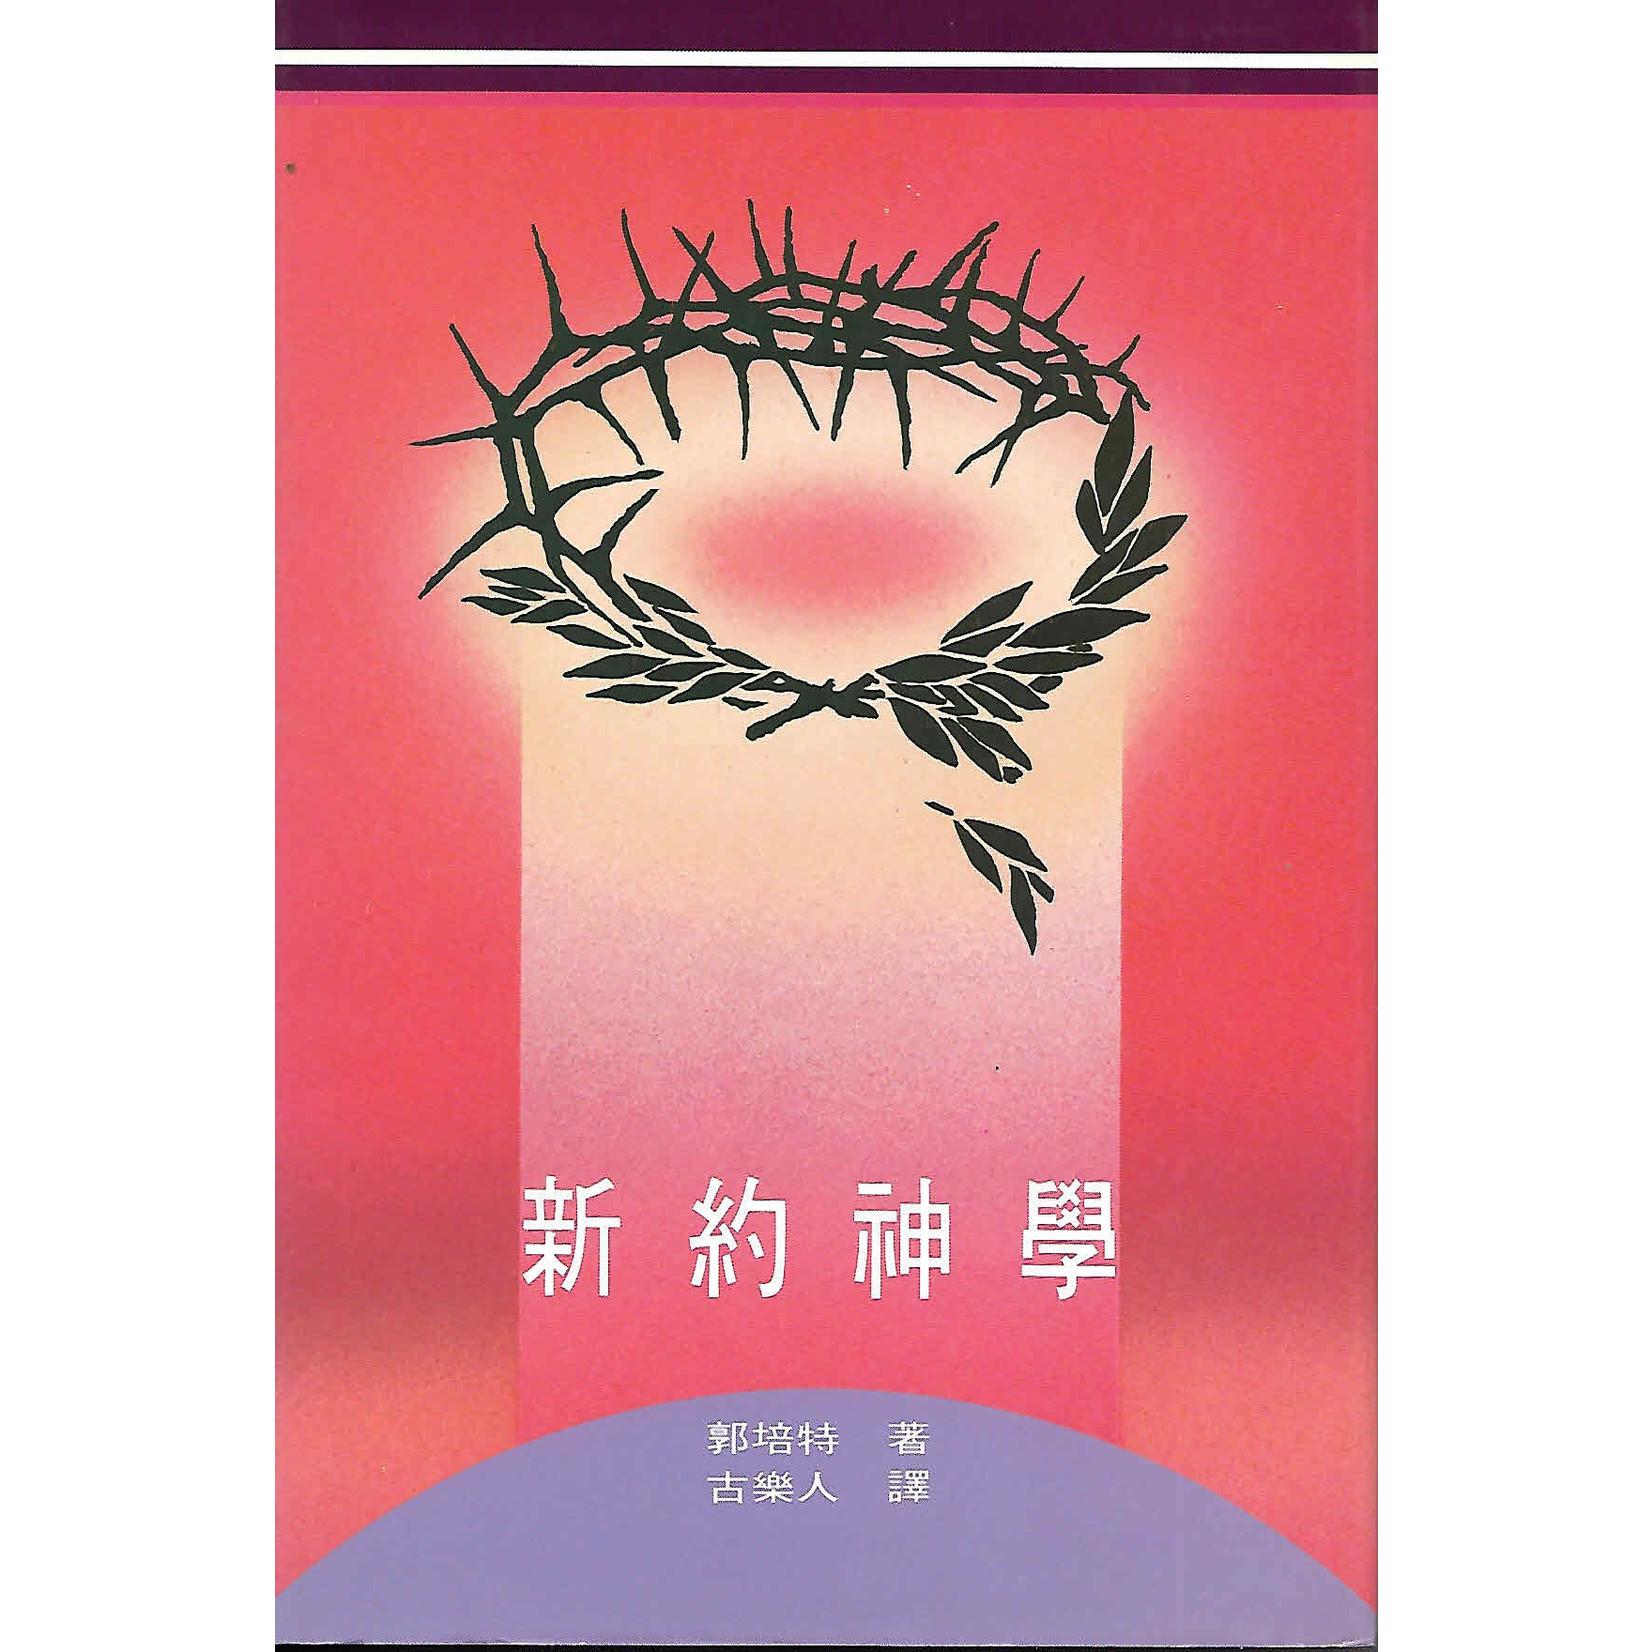 種籽 Seed Press 新約神學(上下冊全套) Theology of the New Testament